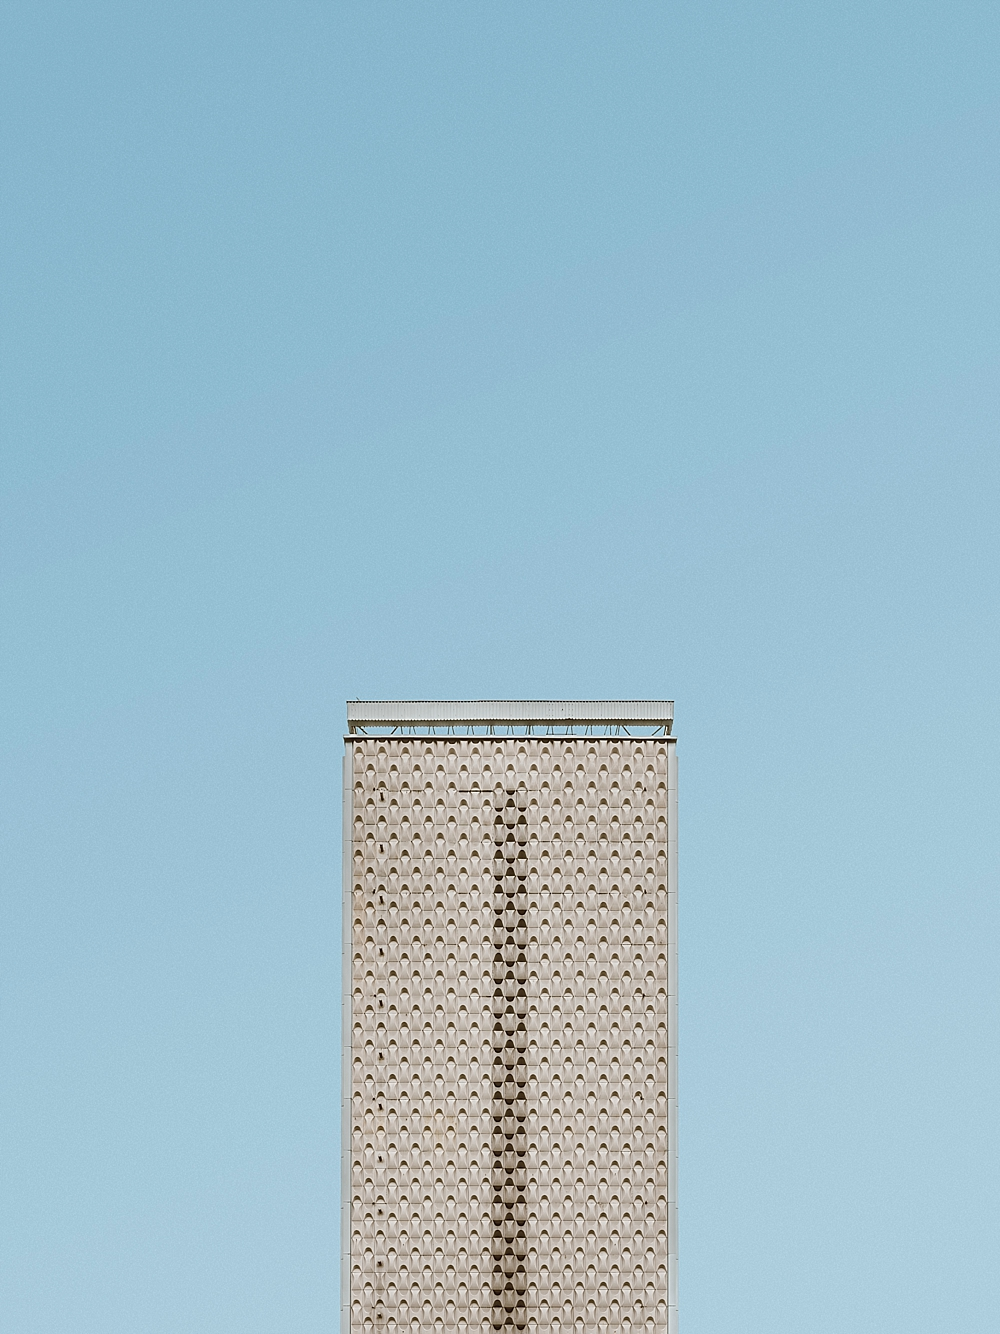 singularity_06-Dresden